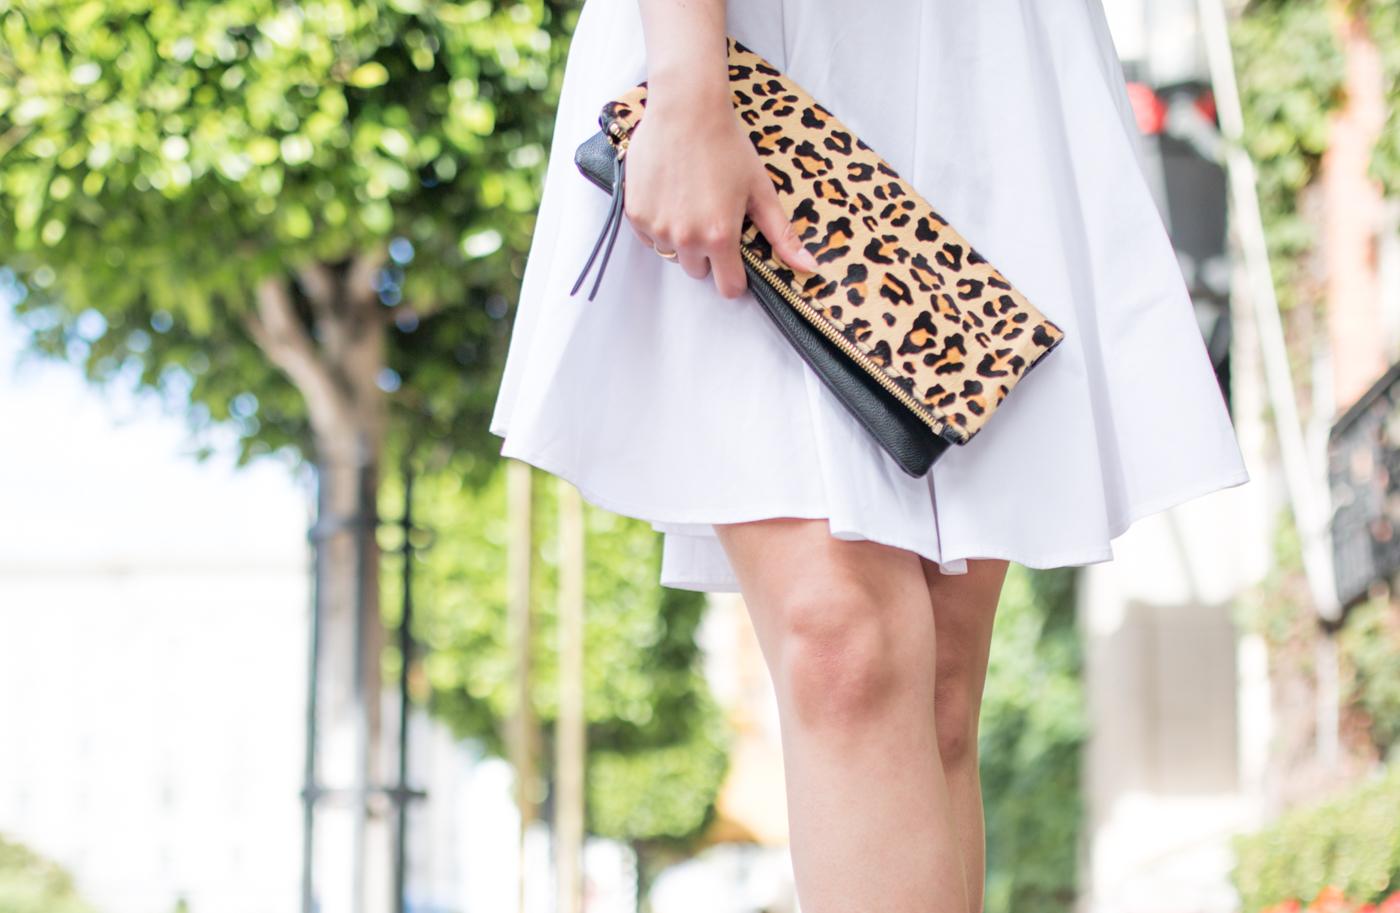 Banana Republic Leopard Clutch | via The Chic Diary